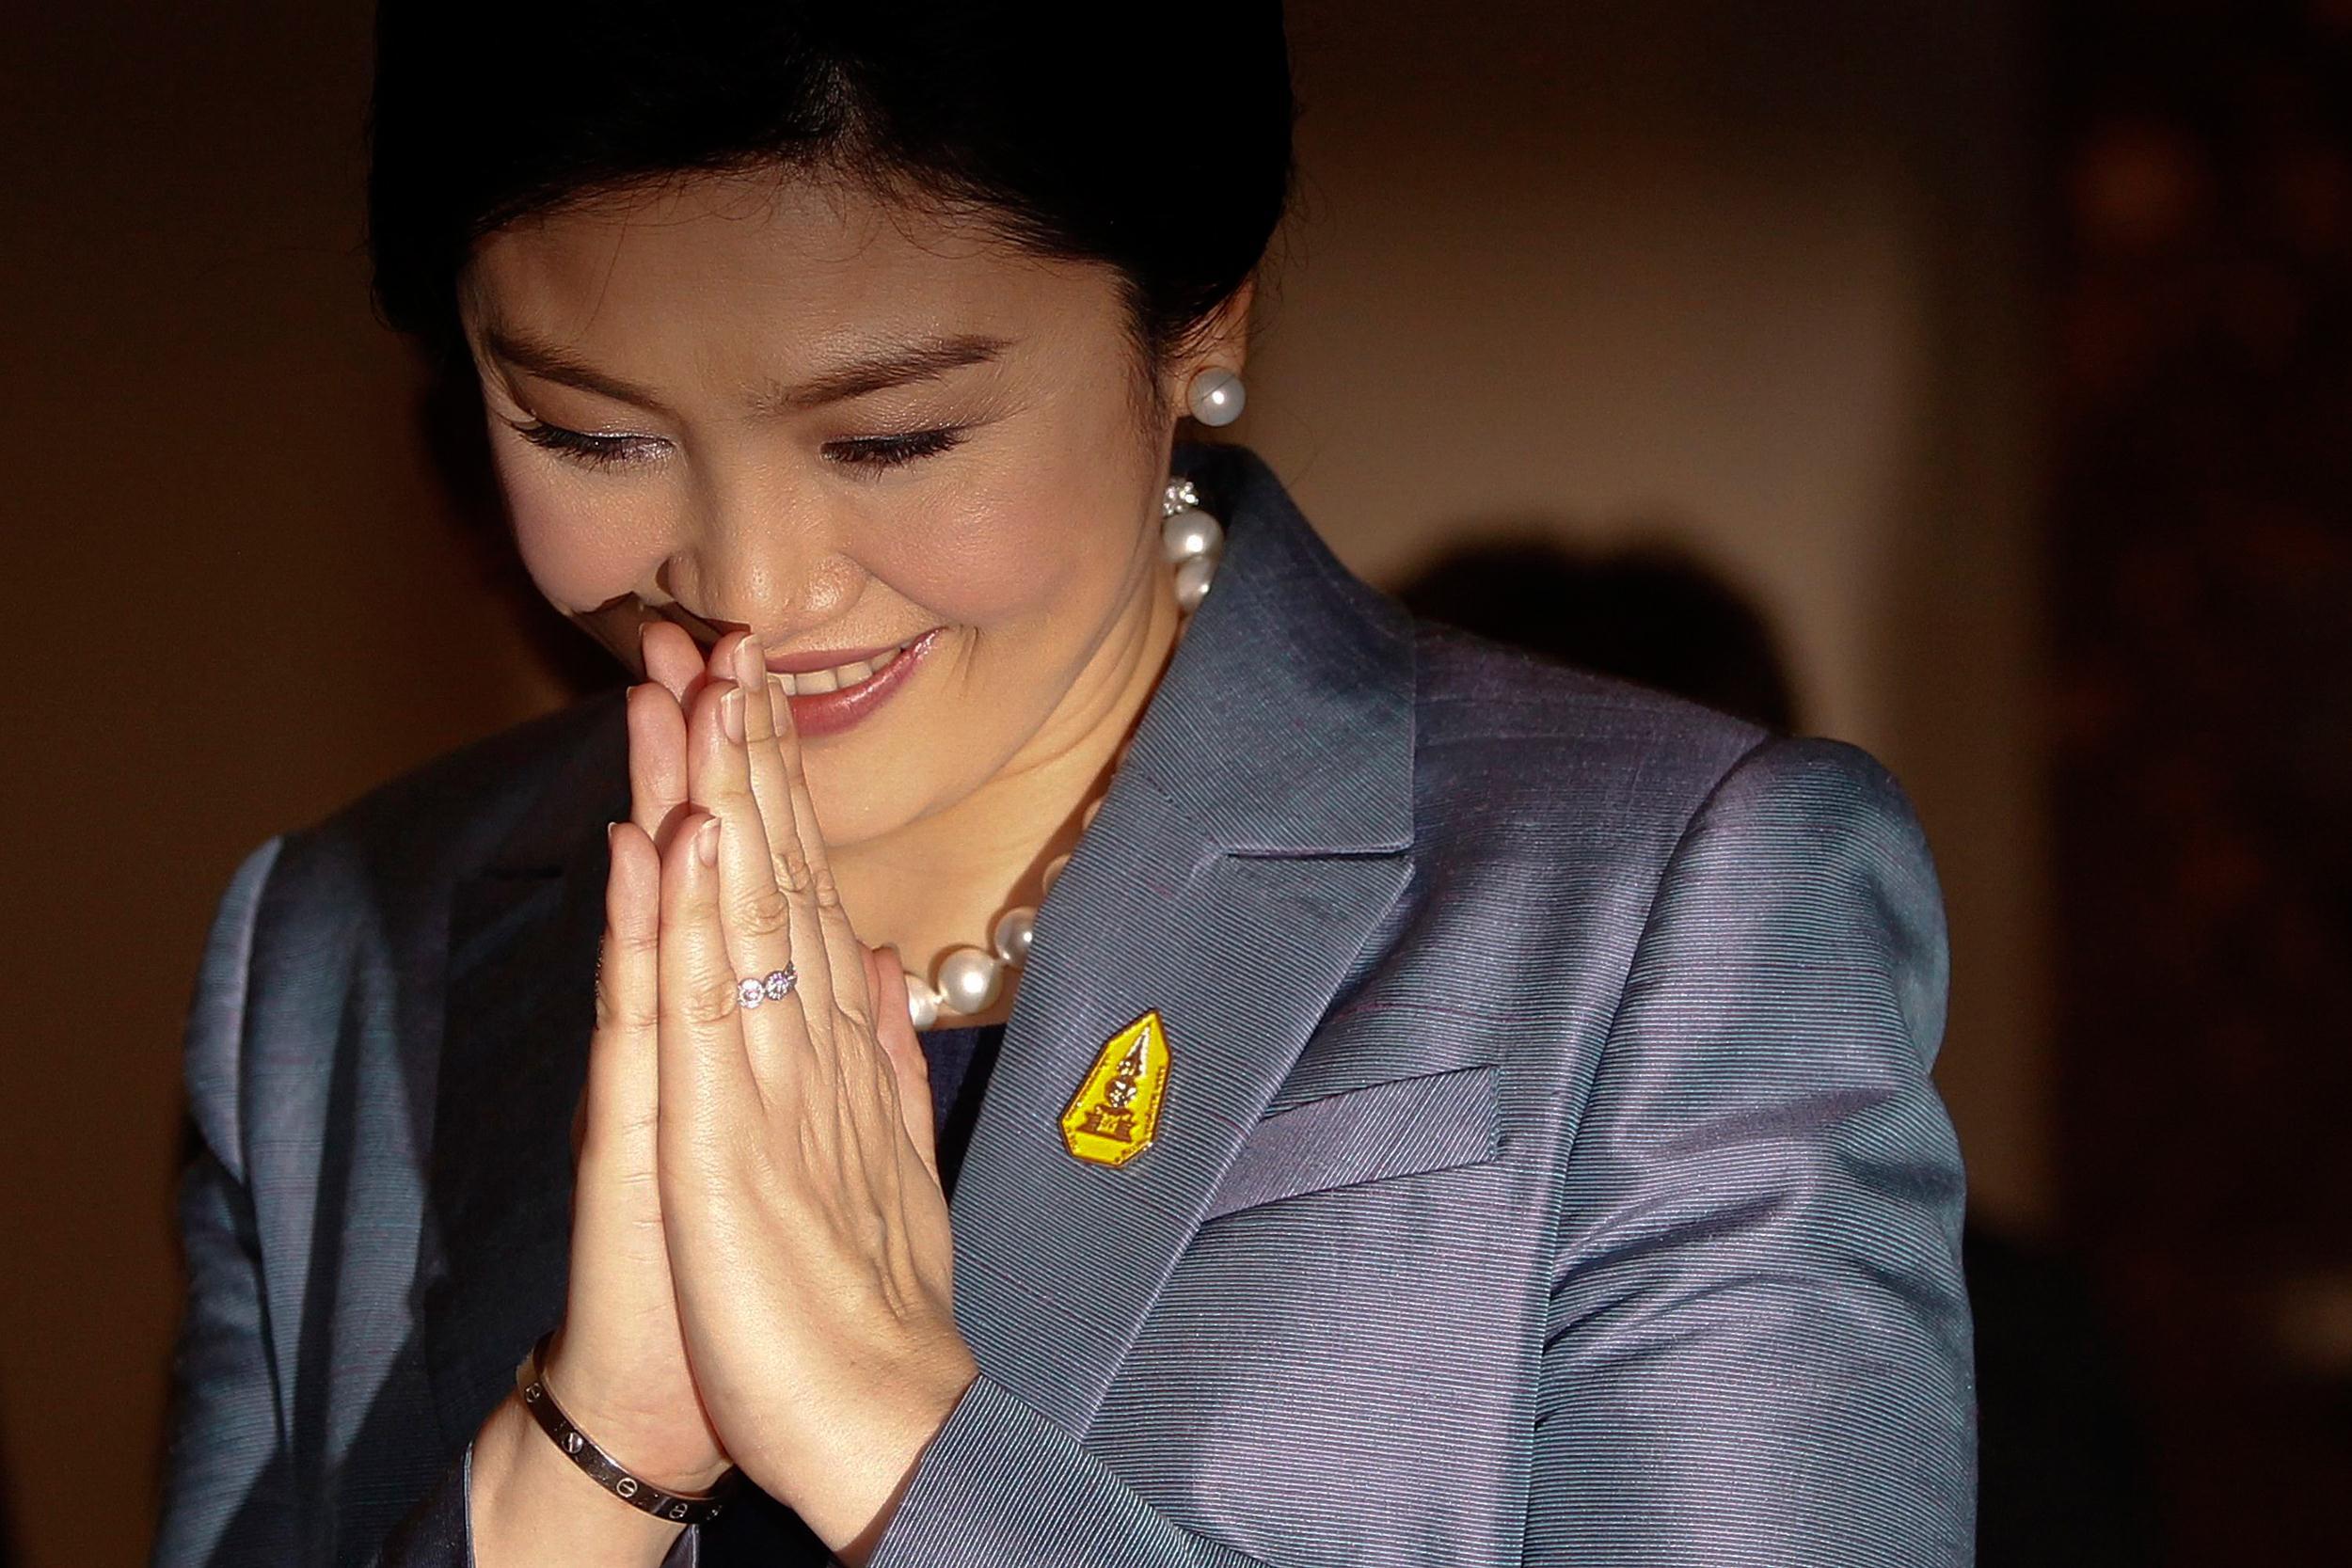 Image: Thailand's Prime Minister Yingluck Shinawatra